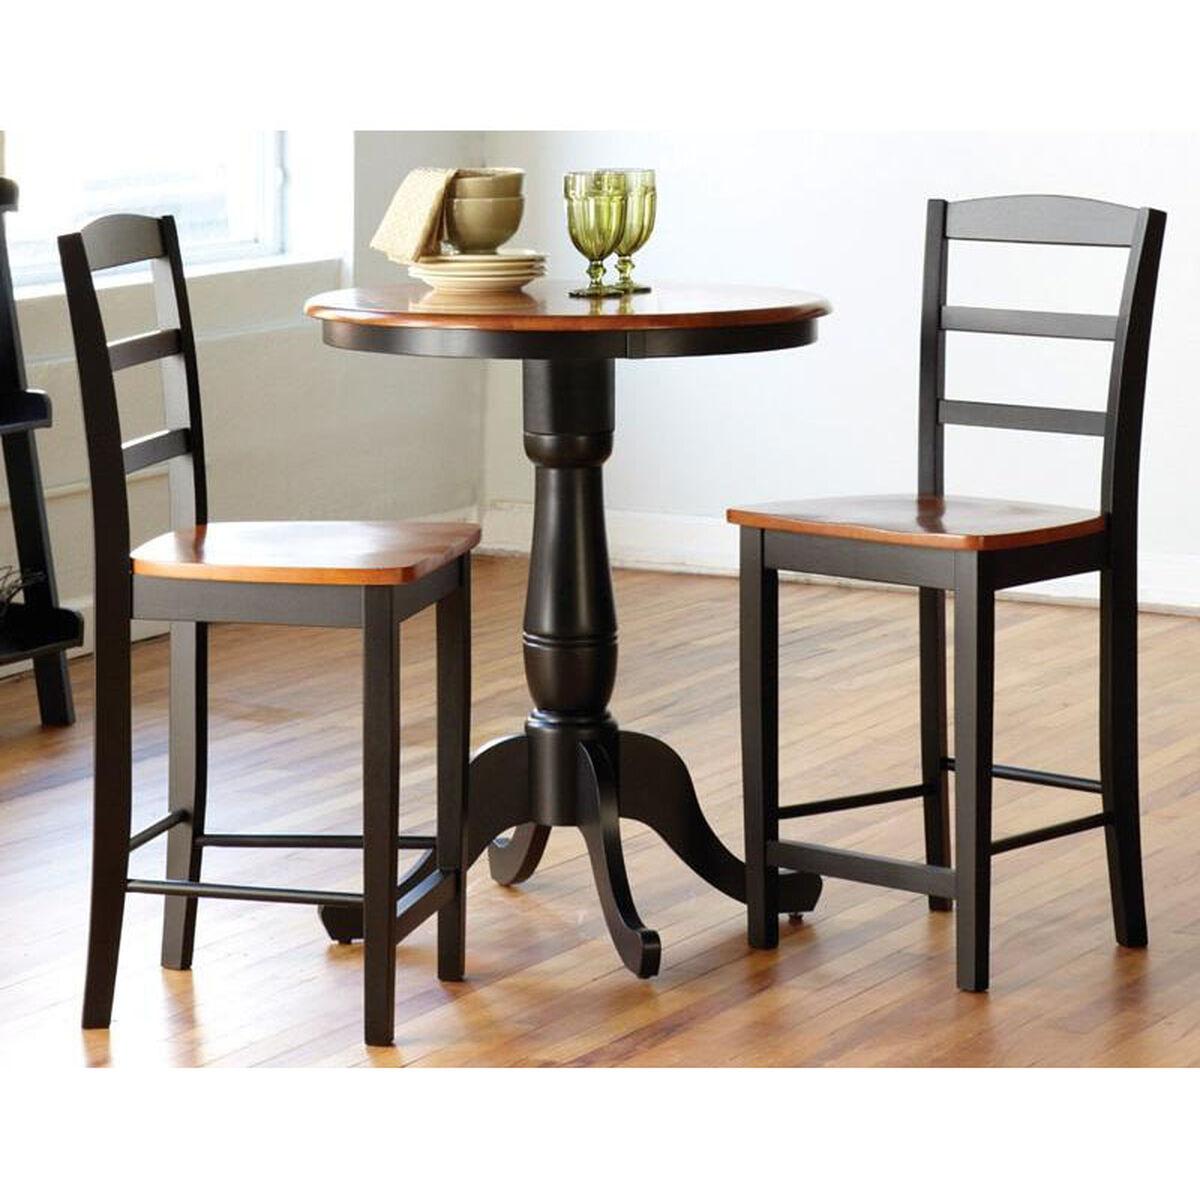 Solid Wood Three Piece Table Set KRTB Bizchaircom - Black pedestal dining table set